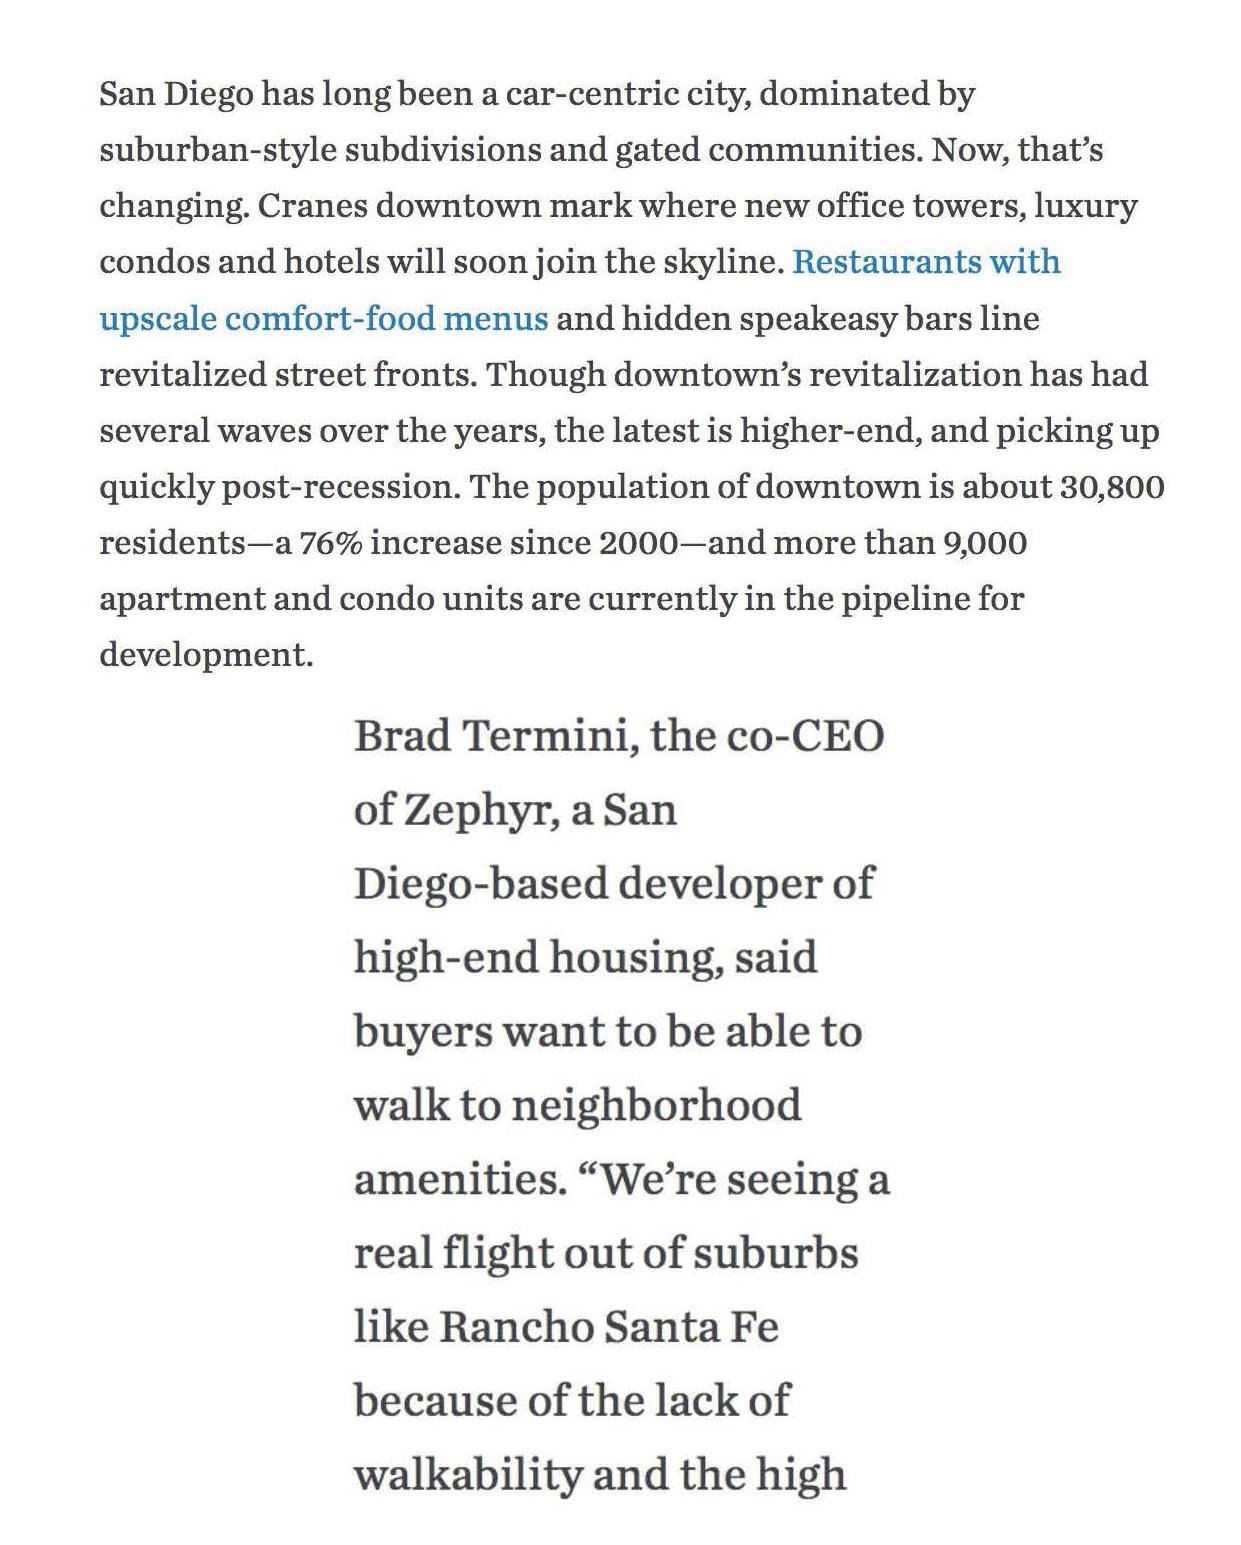 Jan_7_2016 Wall Street Journal_Page_02.jpg